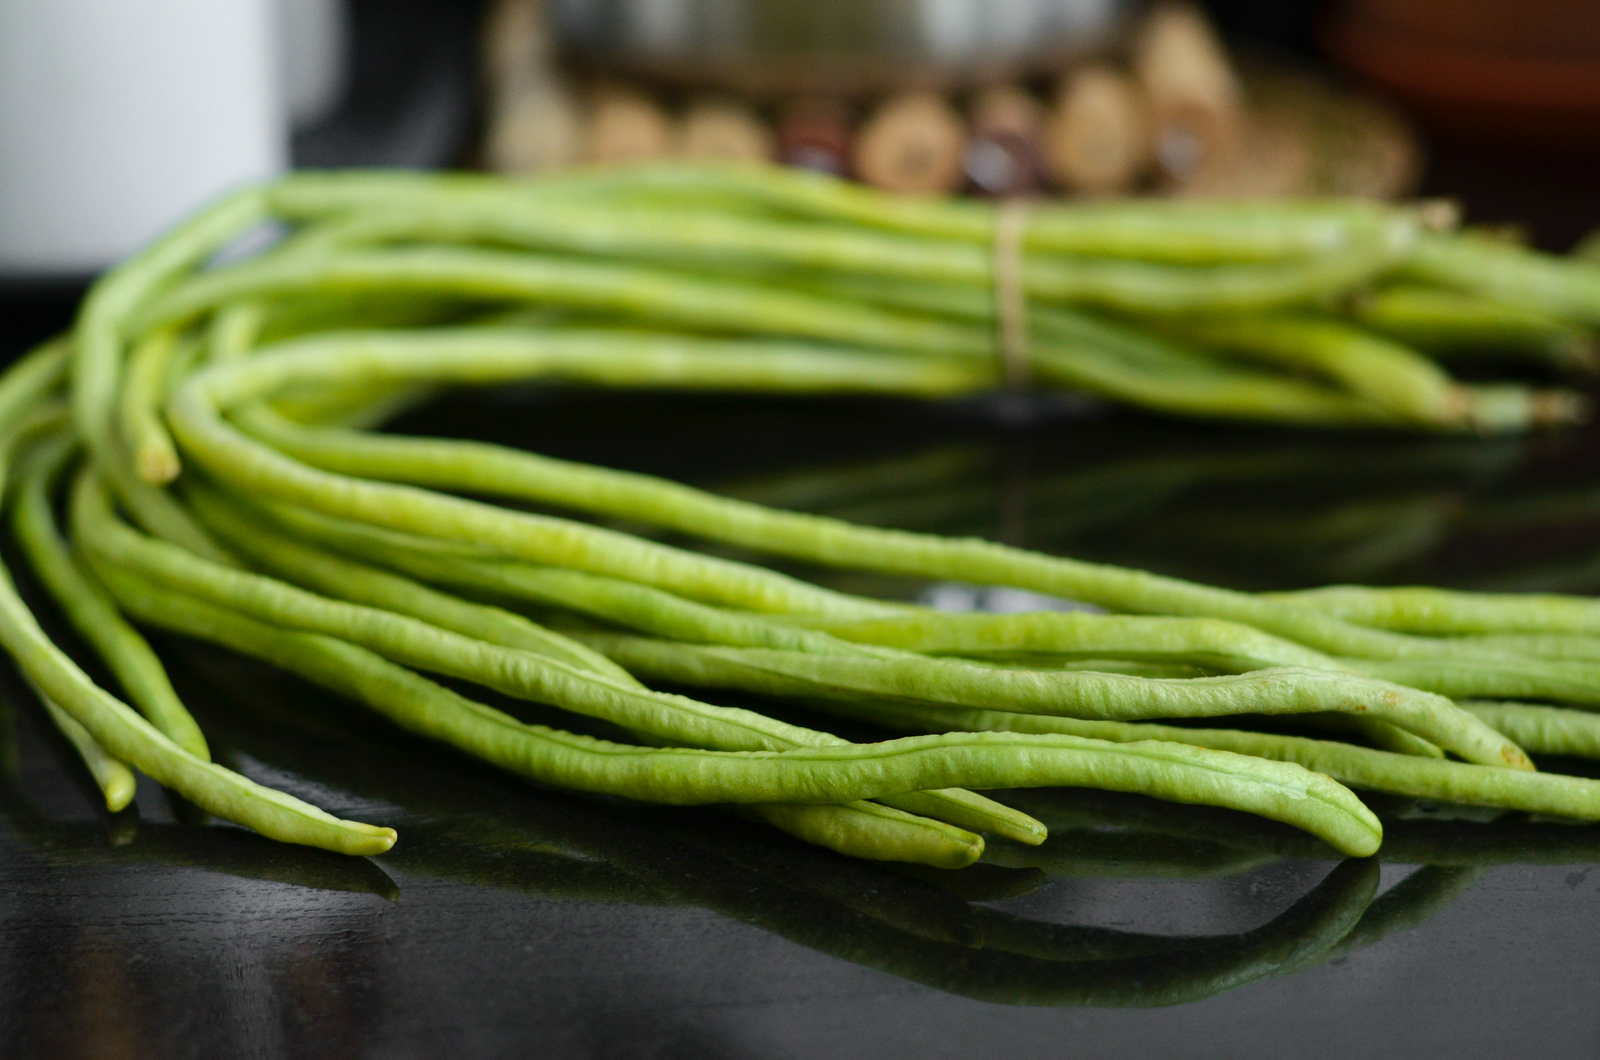 Long string beans bundle